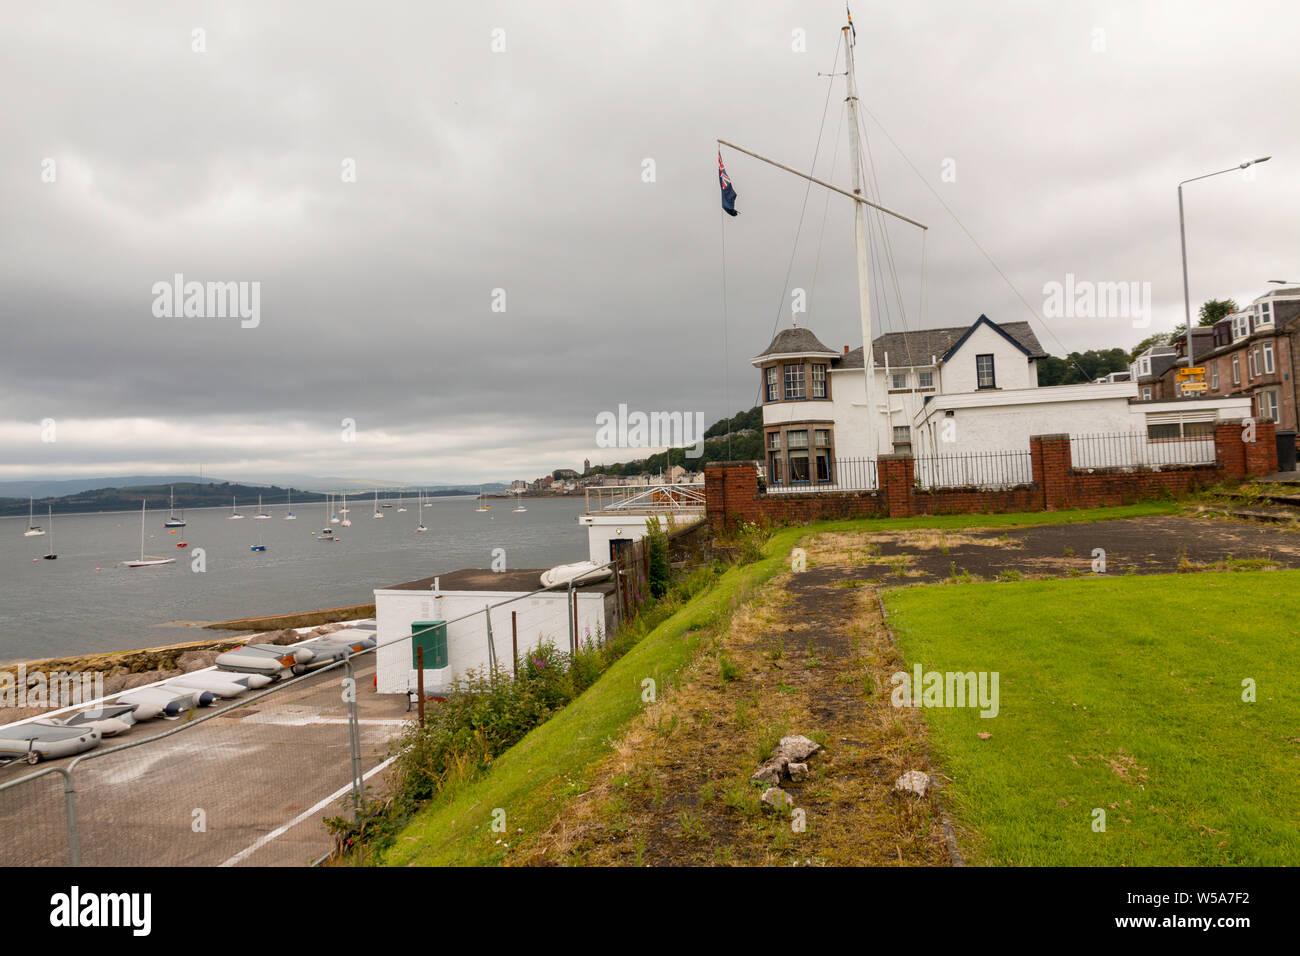 Gourock to Inverkip Coastline West of Scotland July 2019 Stock Photo